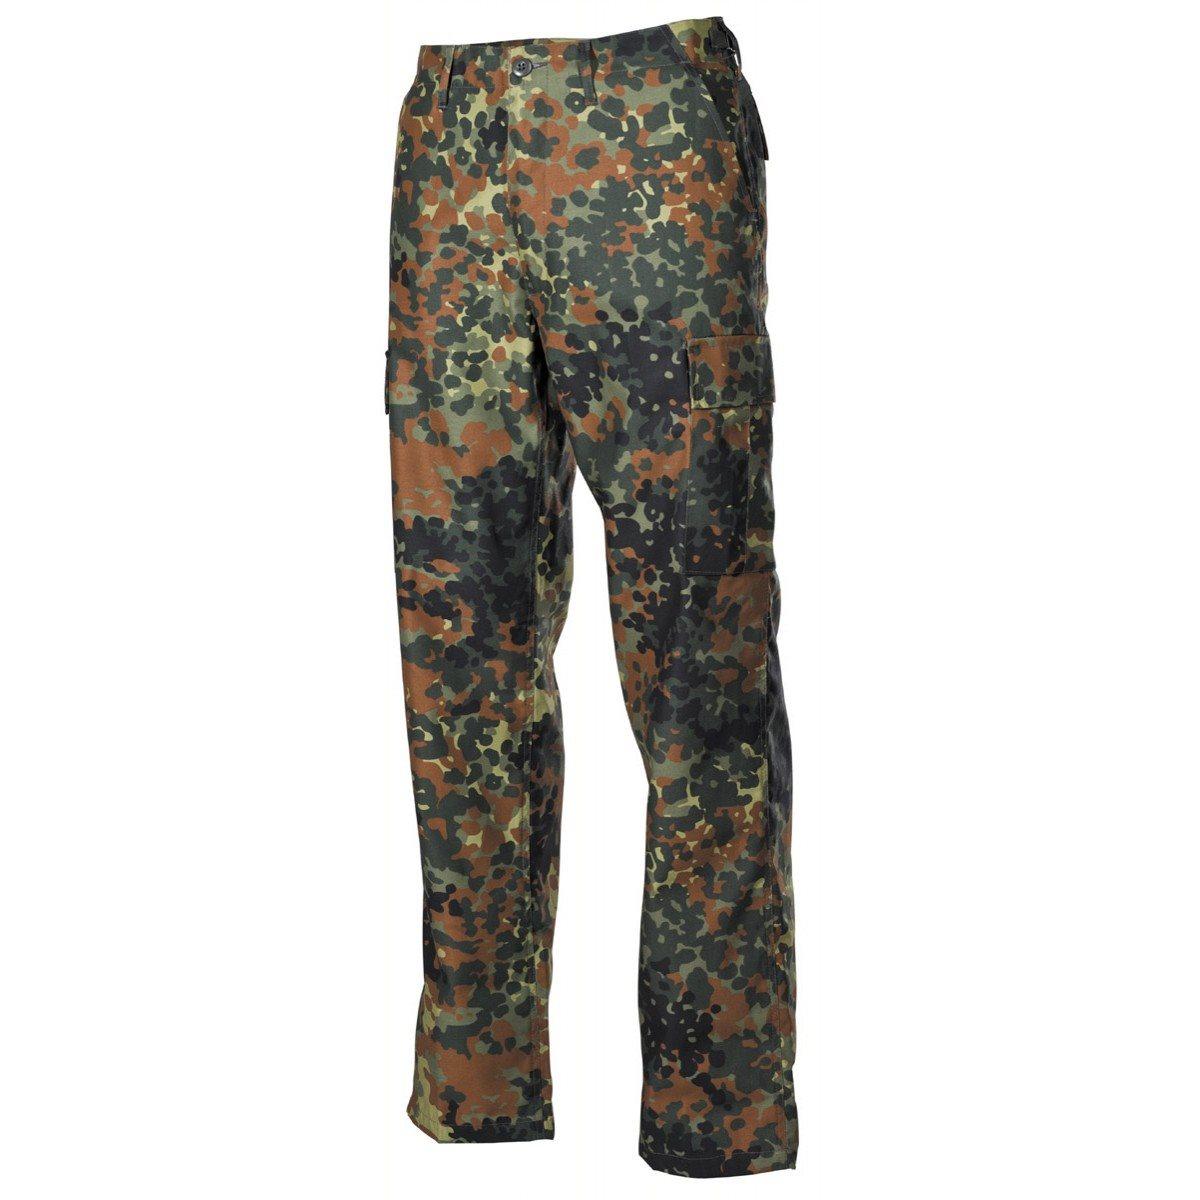 MFH int. comp. | Kalhoty US střih BDU FLECKTARN vel.XL